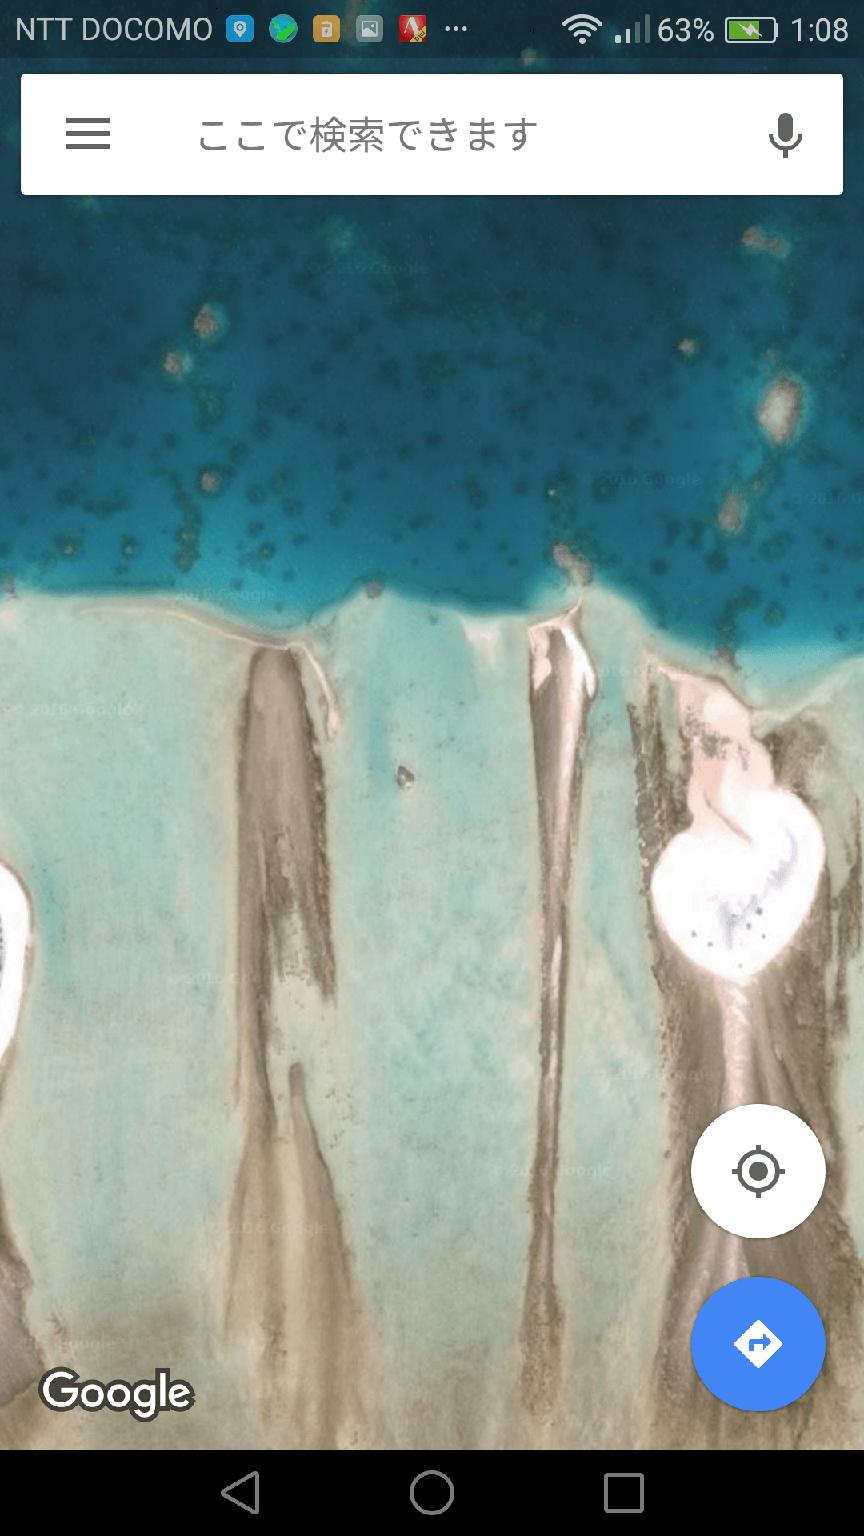 Googleマップに切り替わった画面